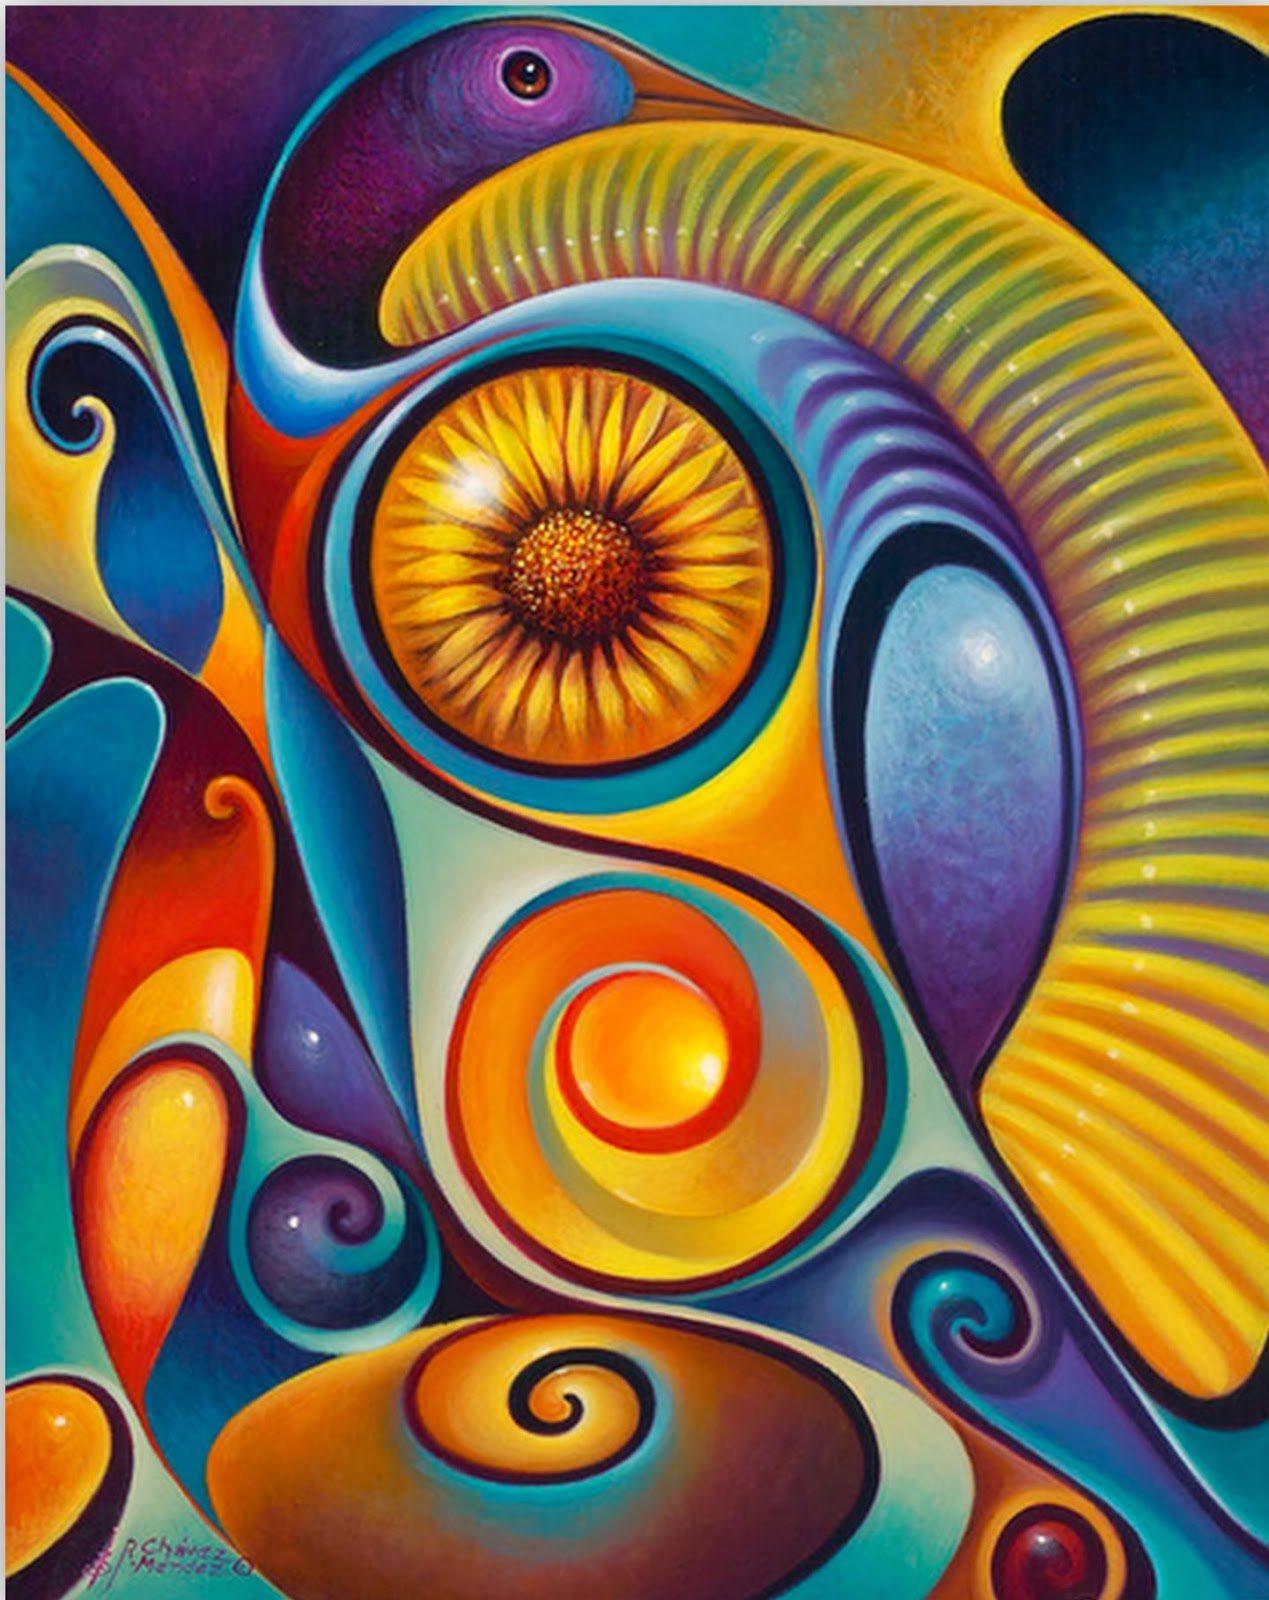 Im genes arte pinturas pinturas modernas al leo ricardo for Pintura ligera de color topo